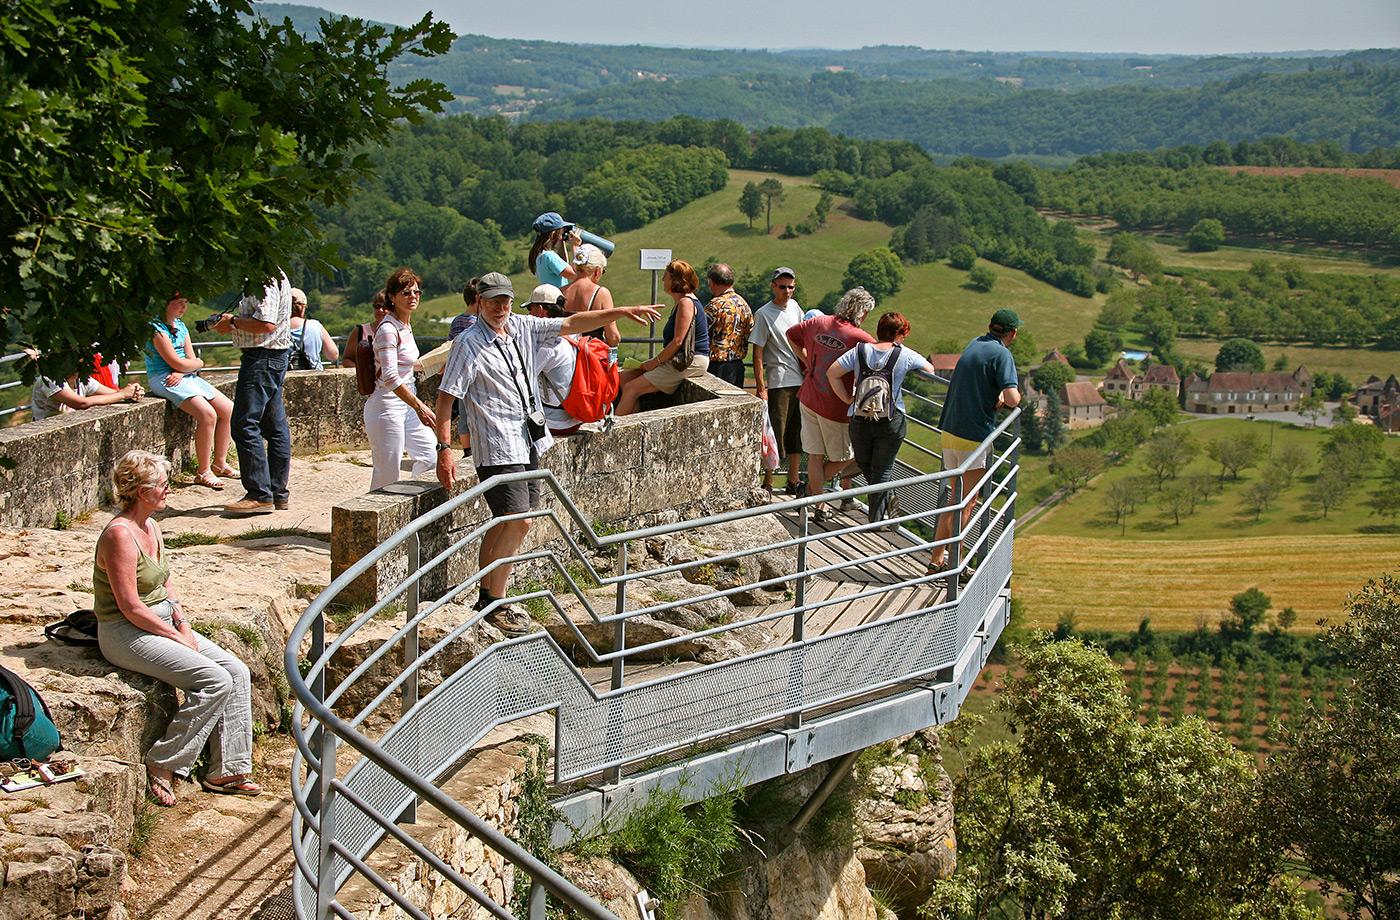 Belvédère de la Dordogne Jardins suspendus de Marqueyssac Vézac Perigord Dordogne